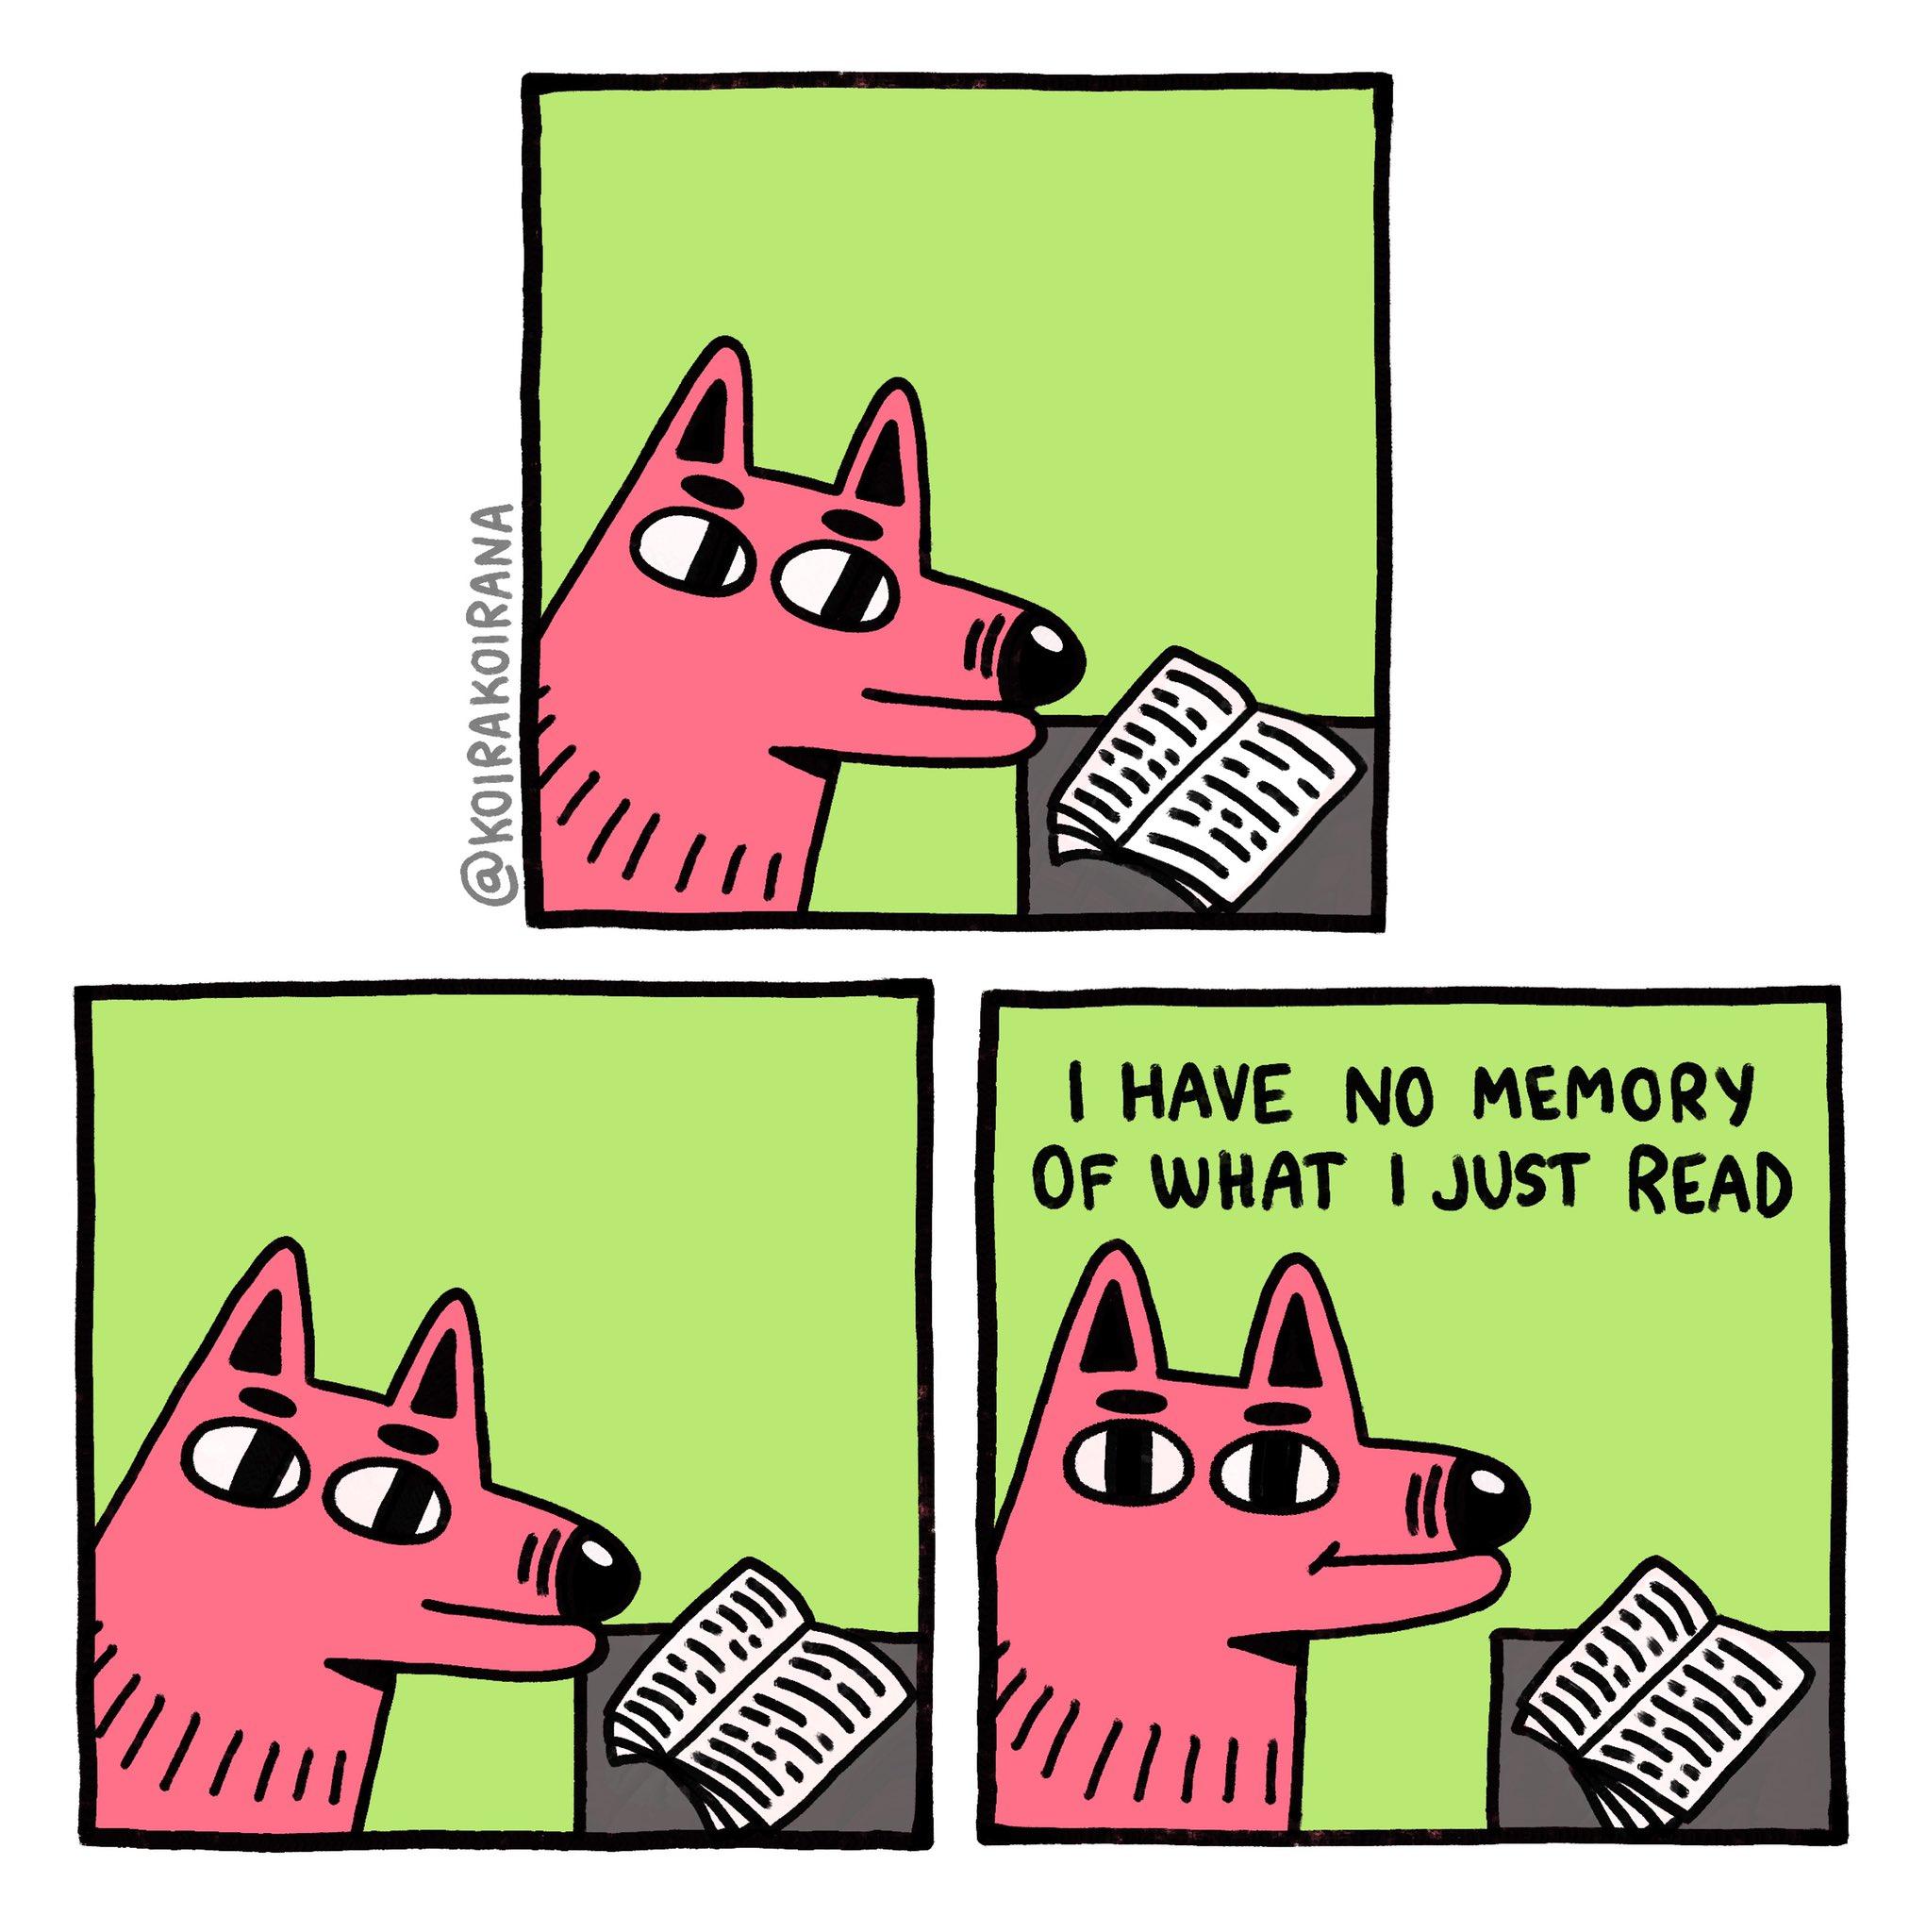 Don't Remember What I Read meme